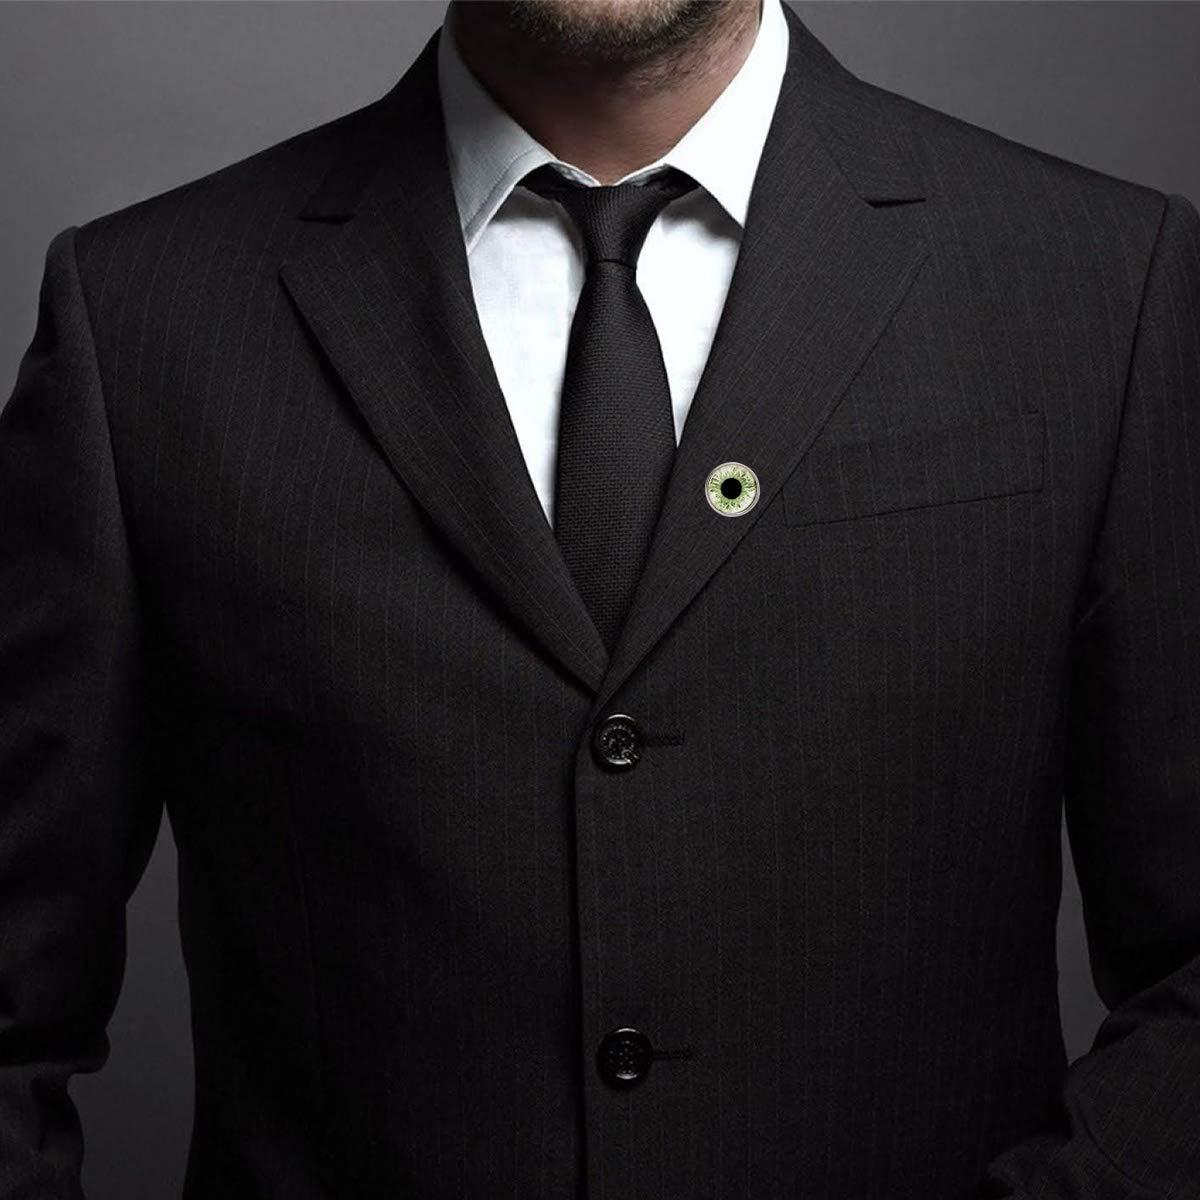 Custom Lapel Pin Brooches Tender Green Eyeball Banquet Badge Pins Trendy Accessory Jacket T-Shirt Bag Hat Shoe